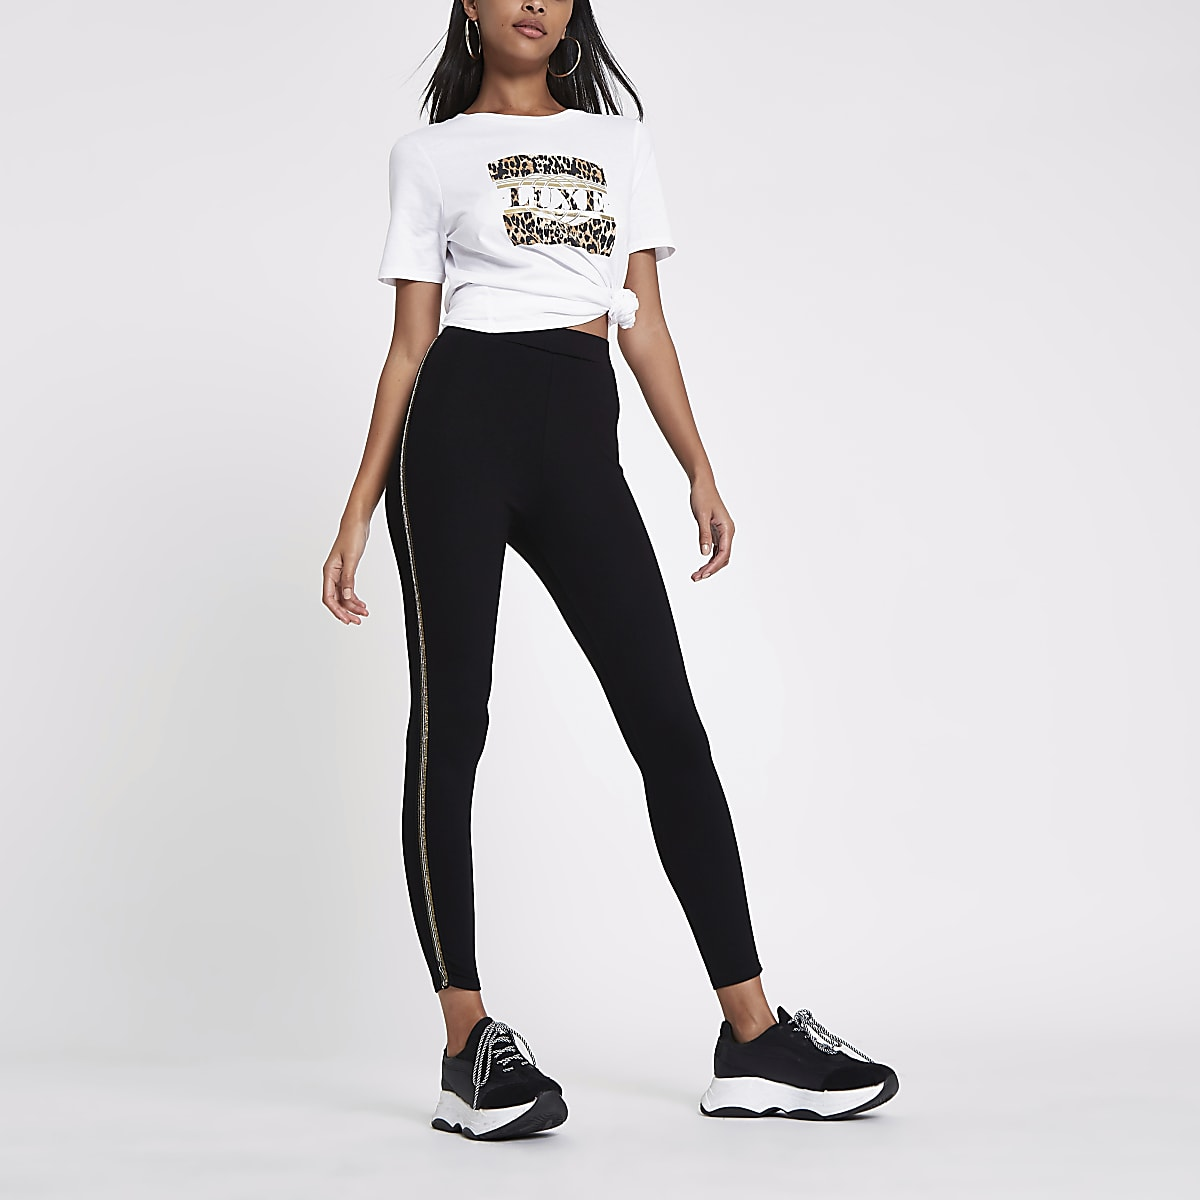 Zwarte legging met pailletten en streep opzij